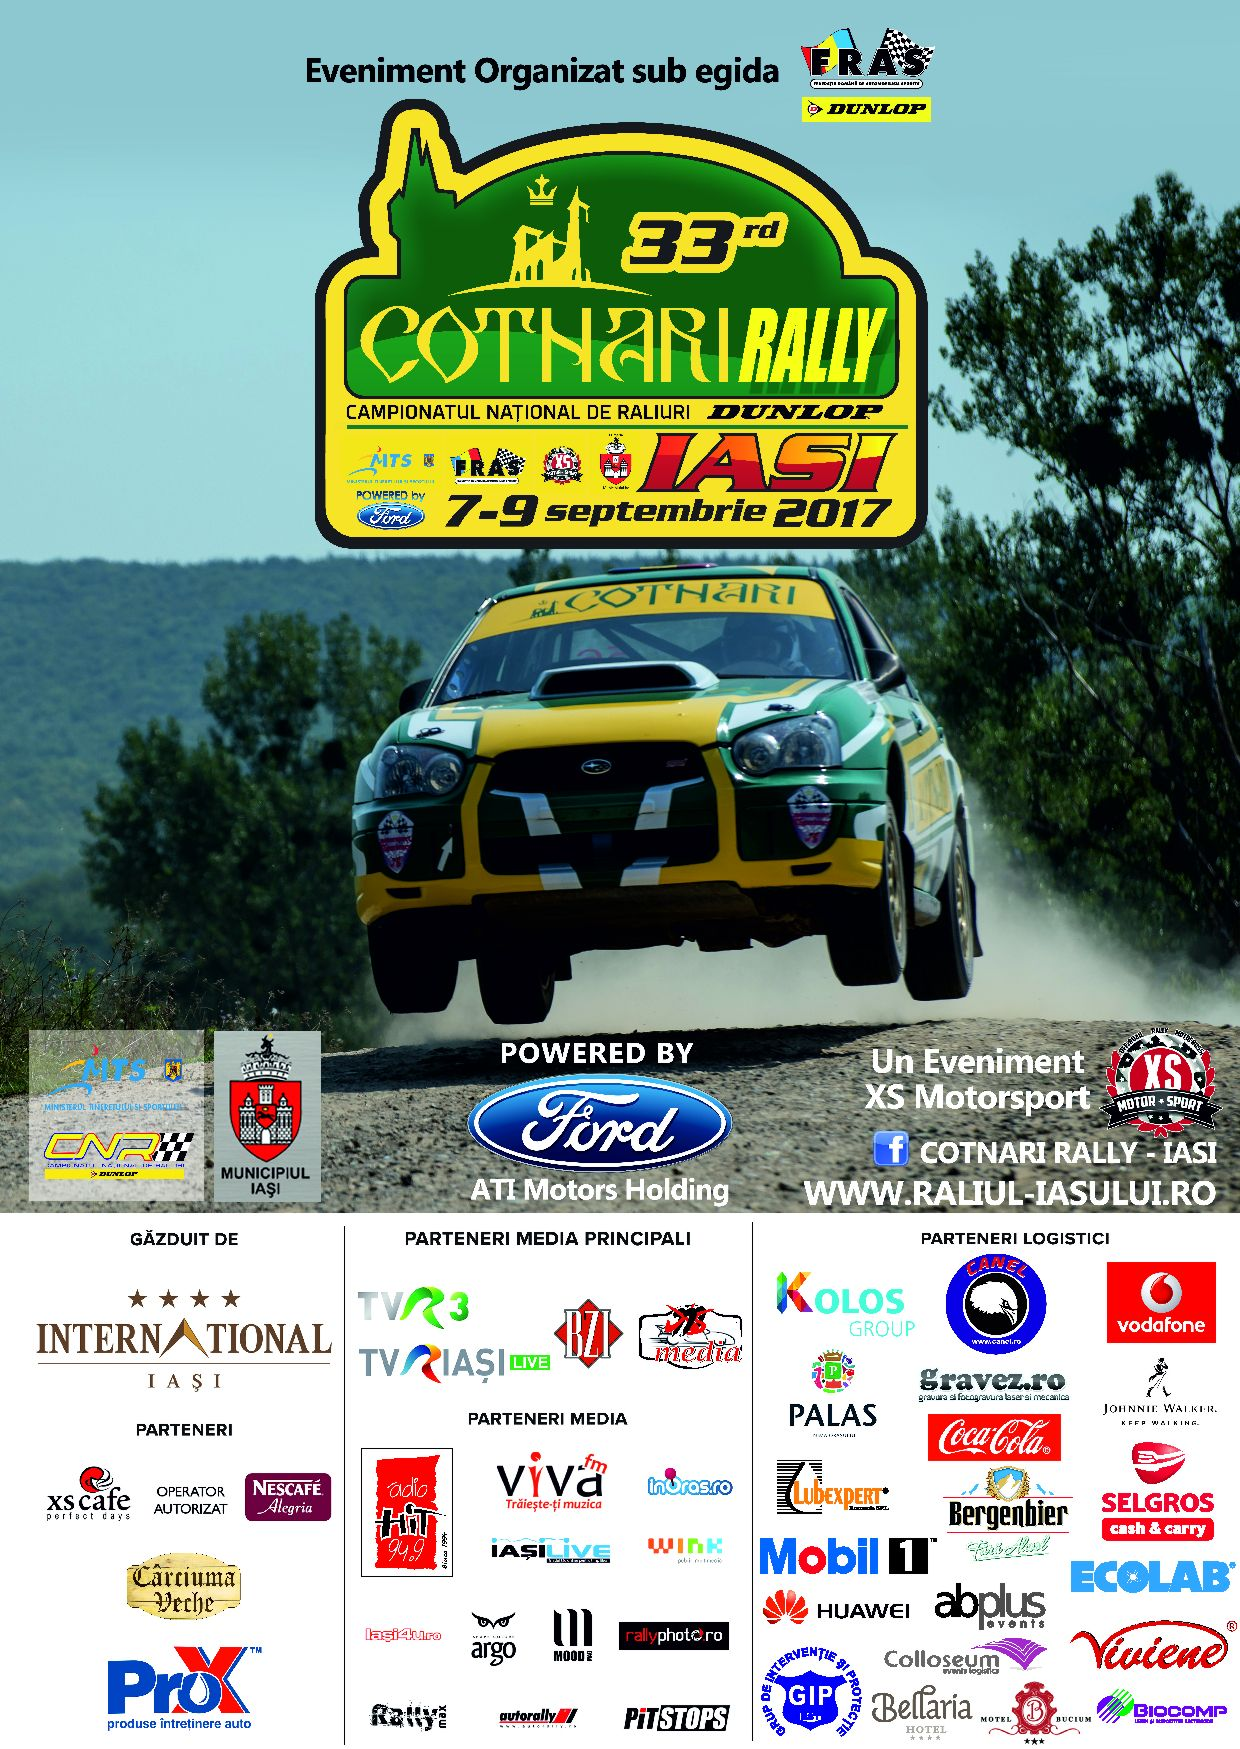 Start in Cotnari Rally Iasi 2017